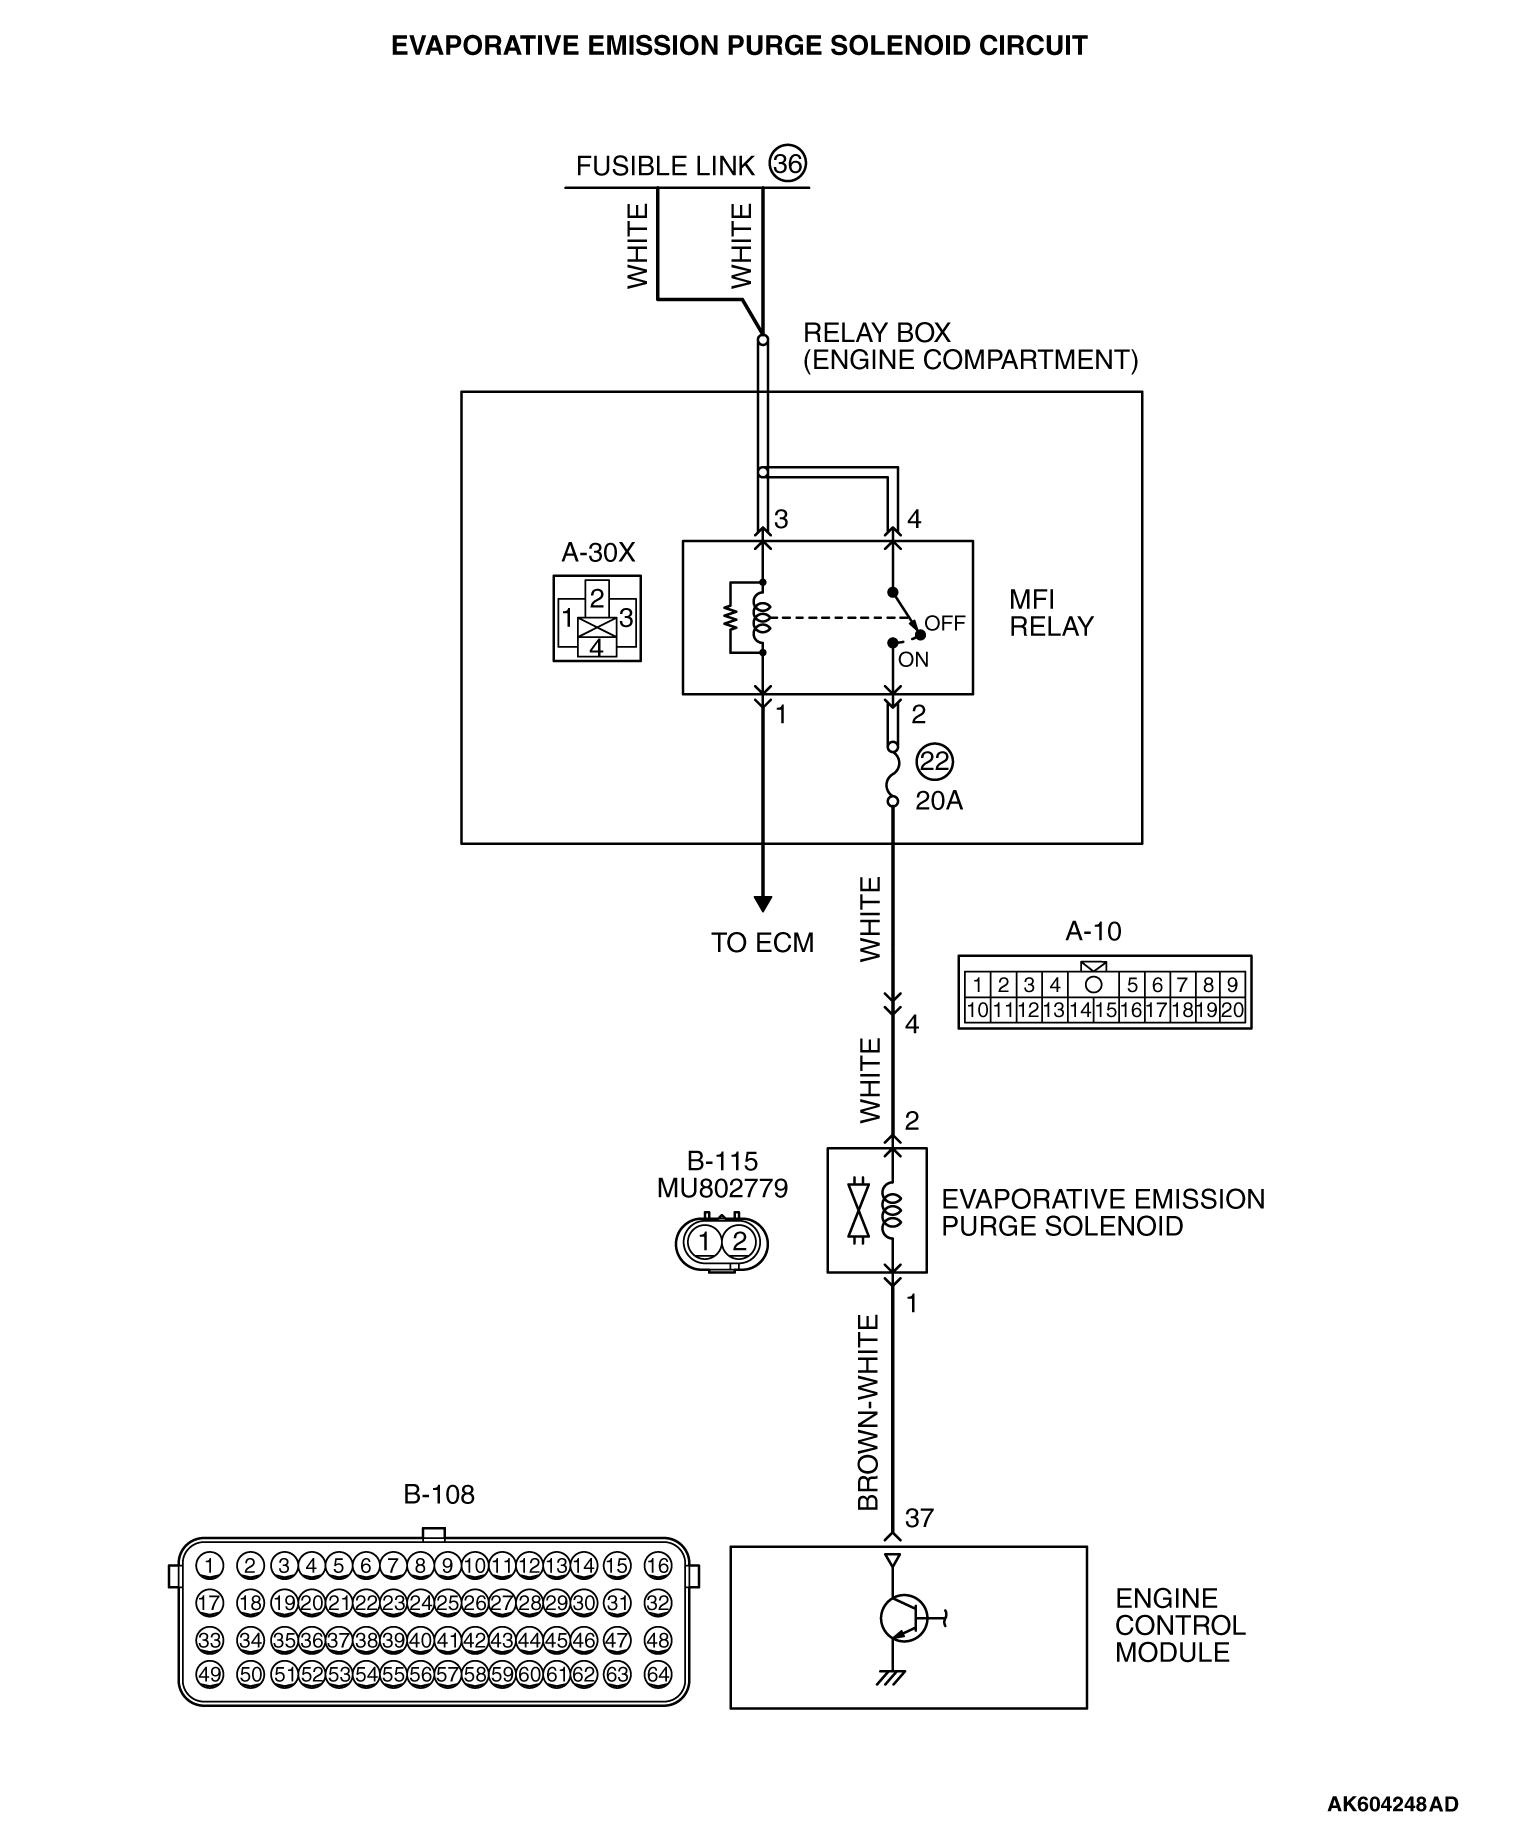 dtc p0443: evaporative emission control system purge control valve circuit